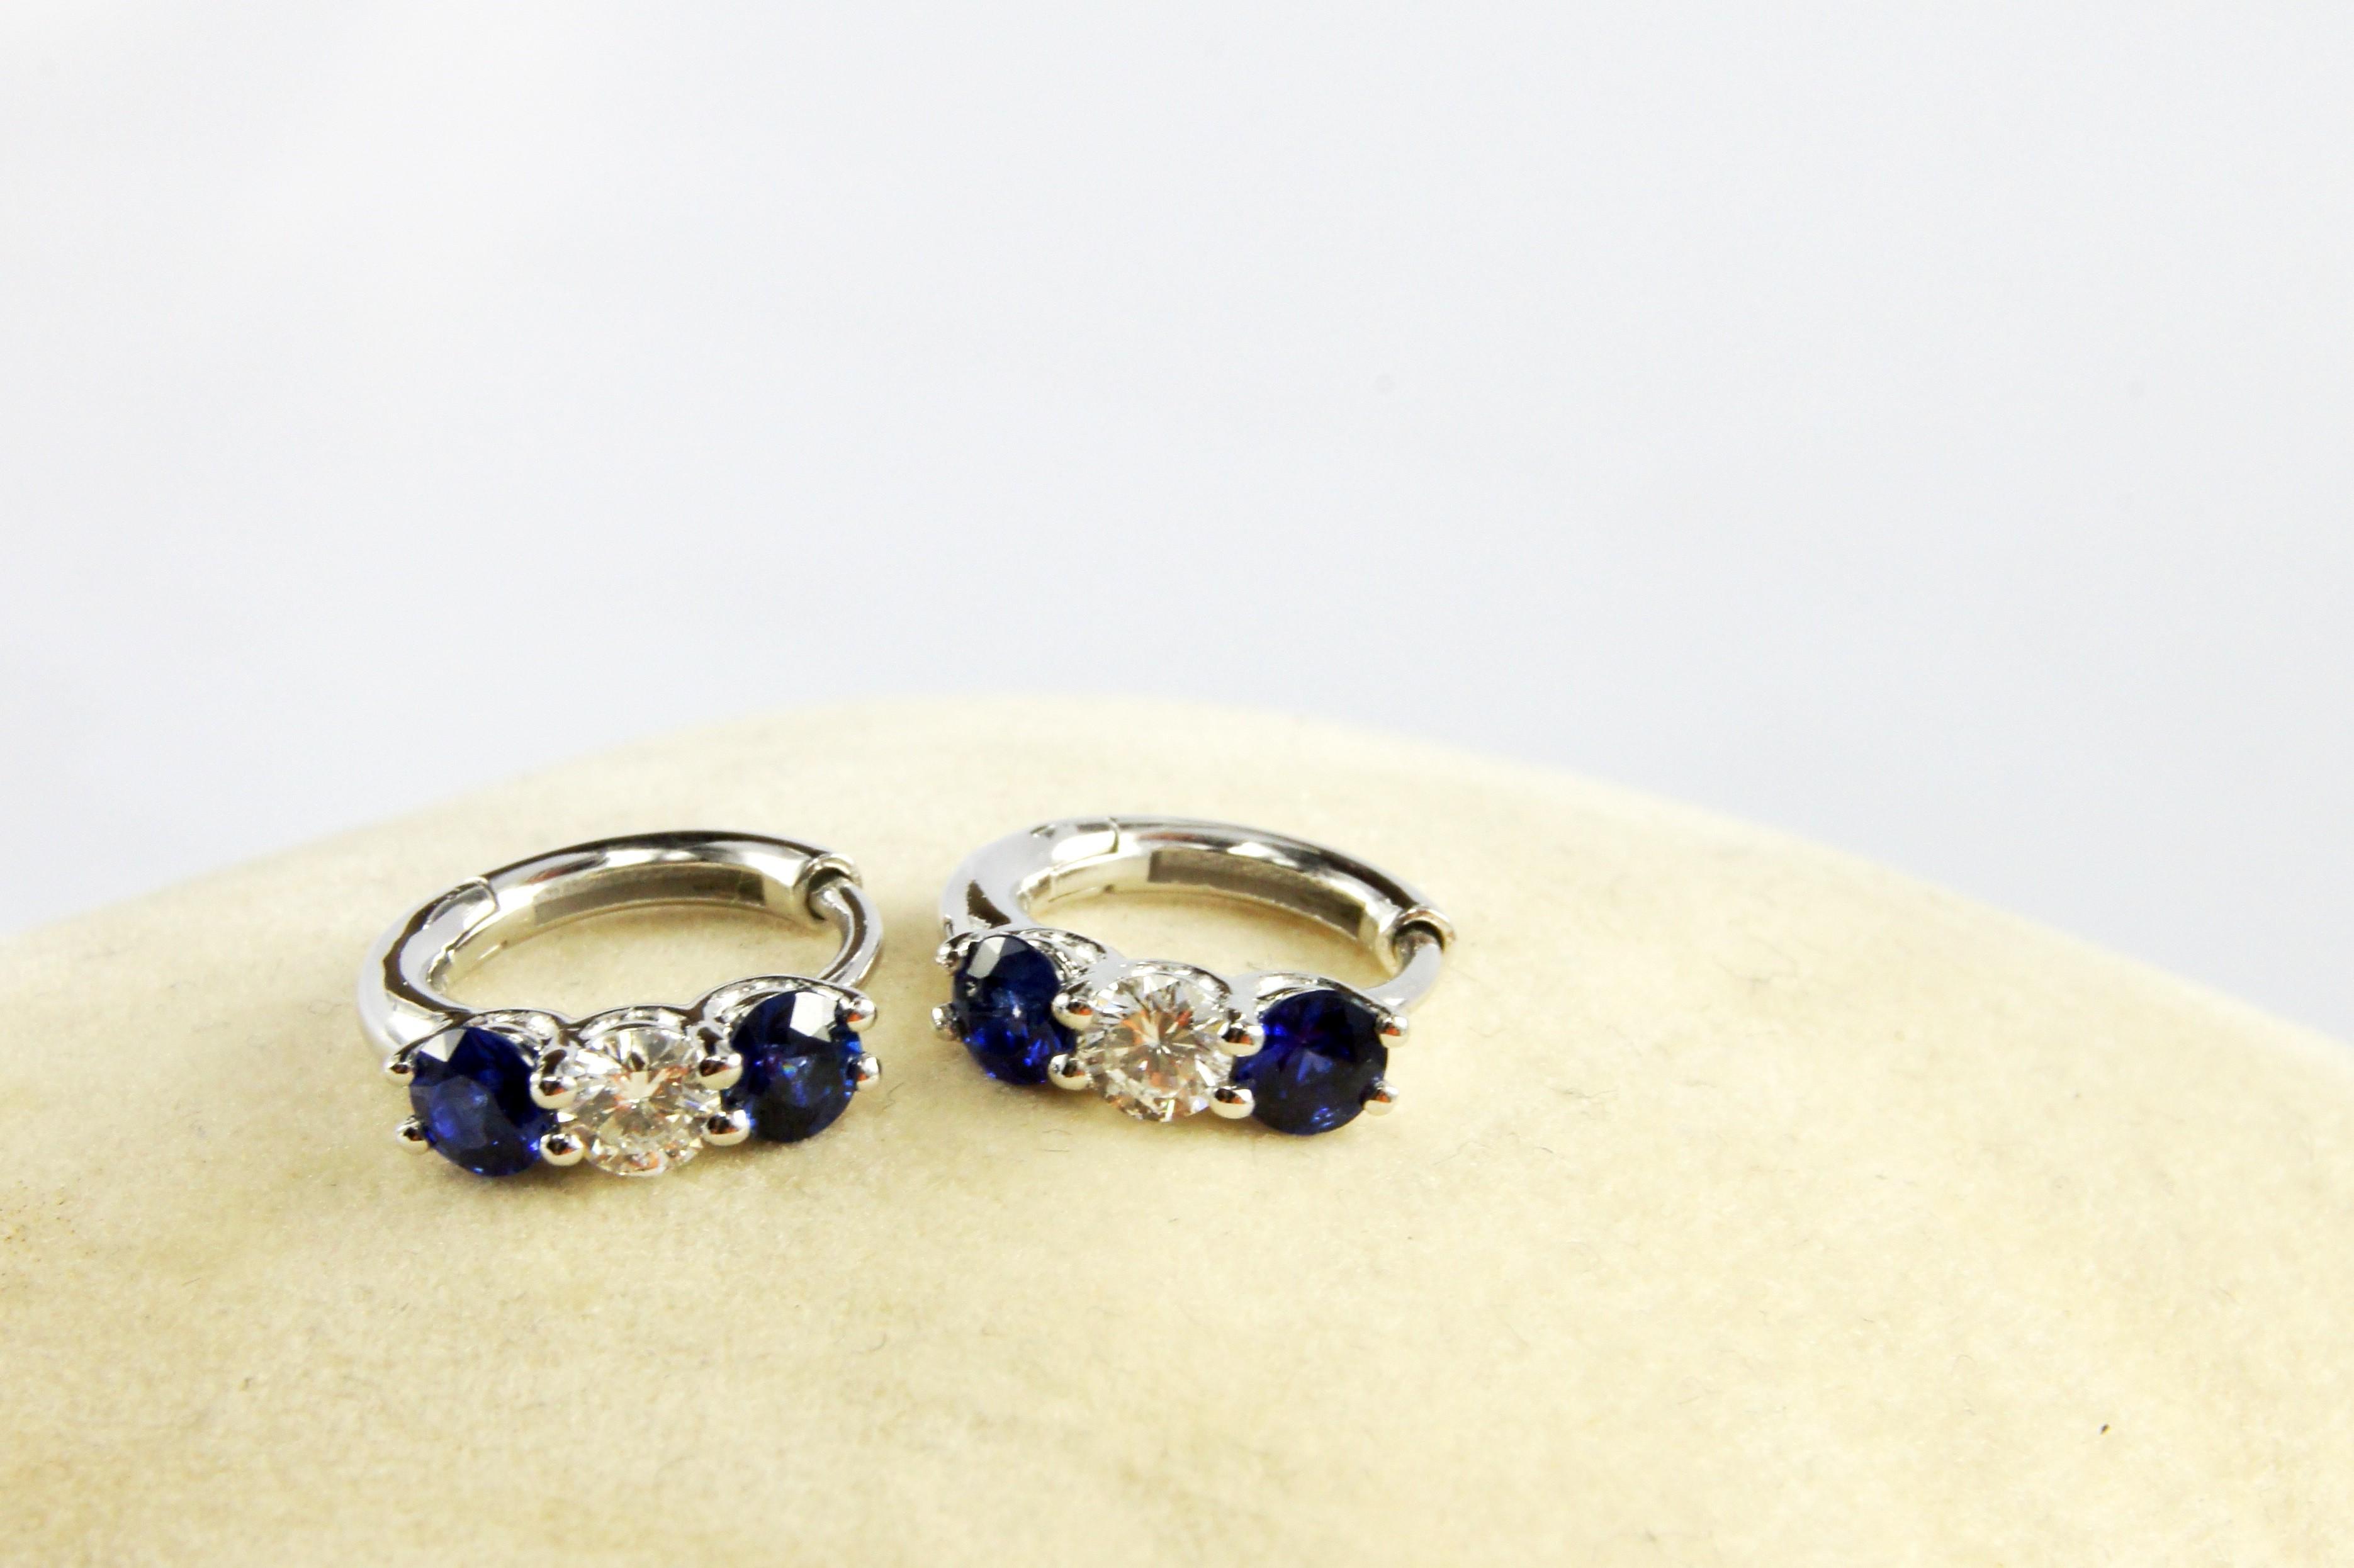 18K White Gold Diamond and Genuine Sapphire loop earrings